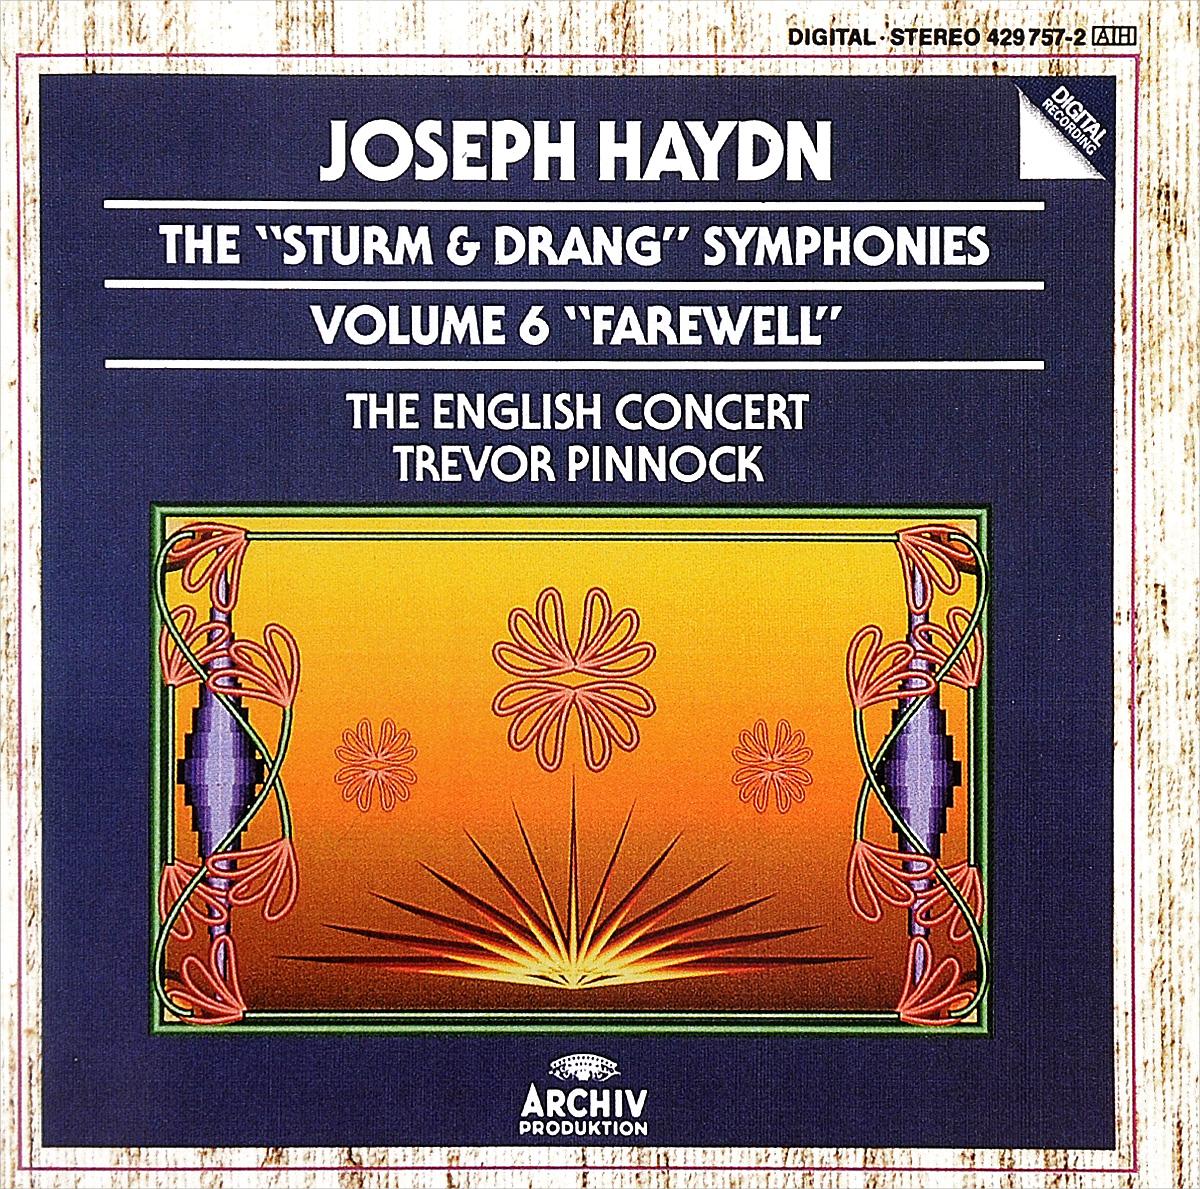 "The English Concert,Тревор Пиннок Trevor Pinnock. Joseph Haydn. The Sturm & Drang Symphonies. Volume 6. ""Farewell"""